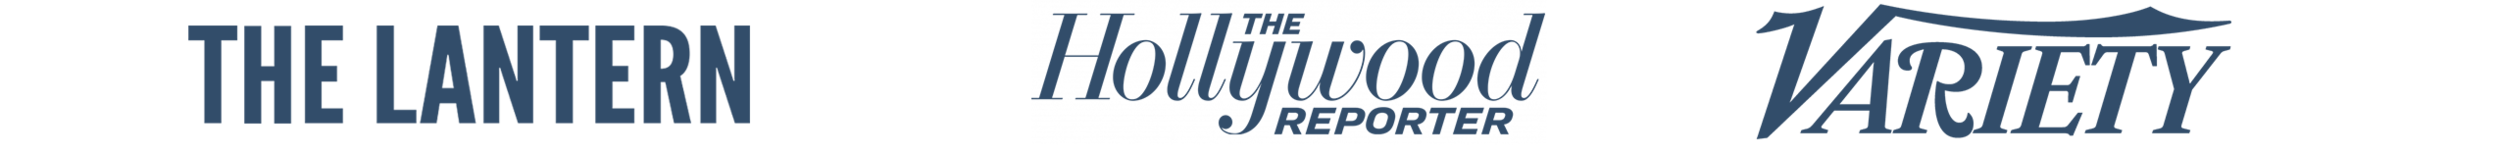 Blue-Press-Logos-AssetLogos-Line-1-copy.png